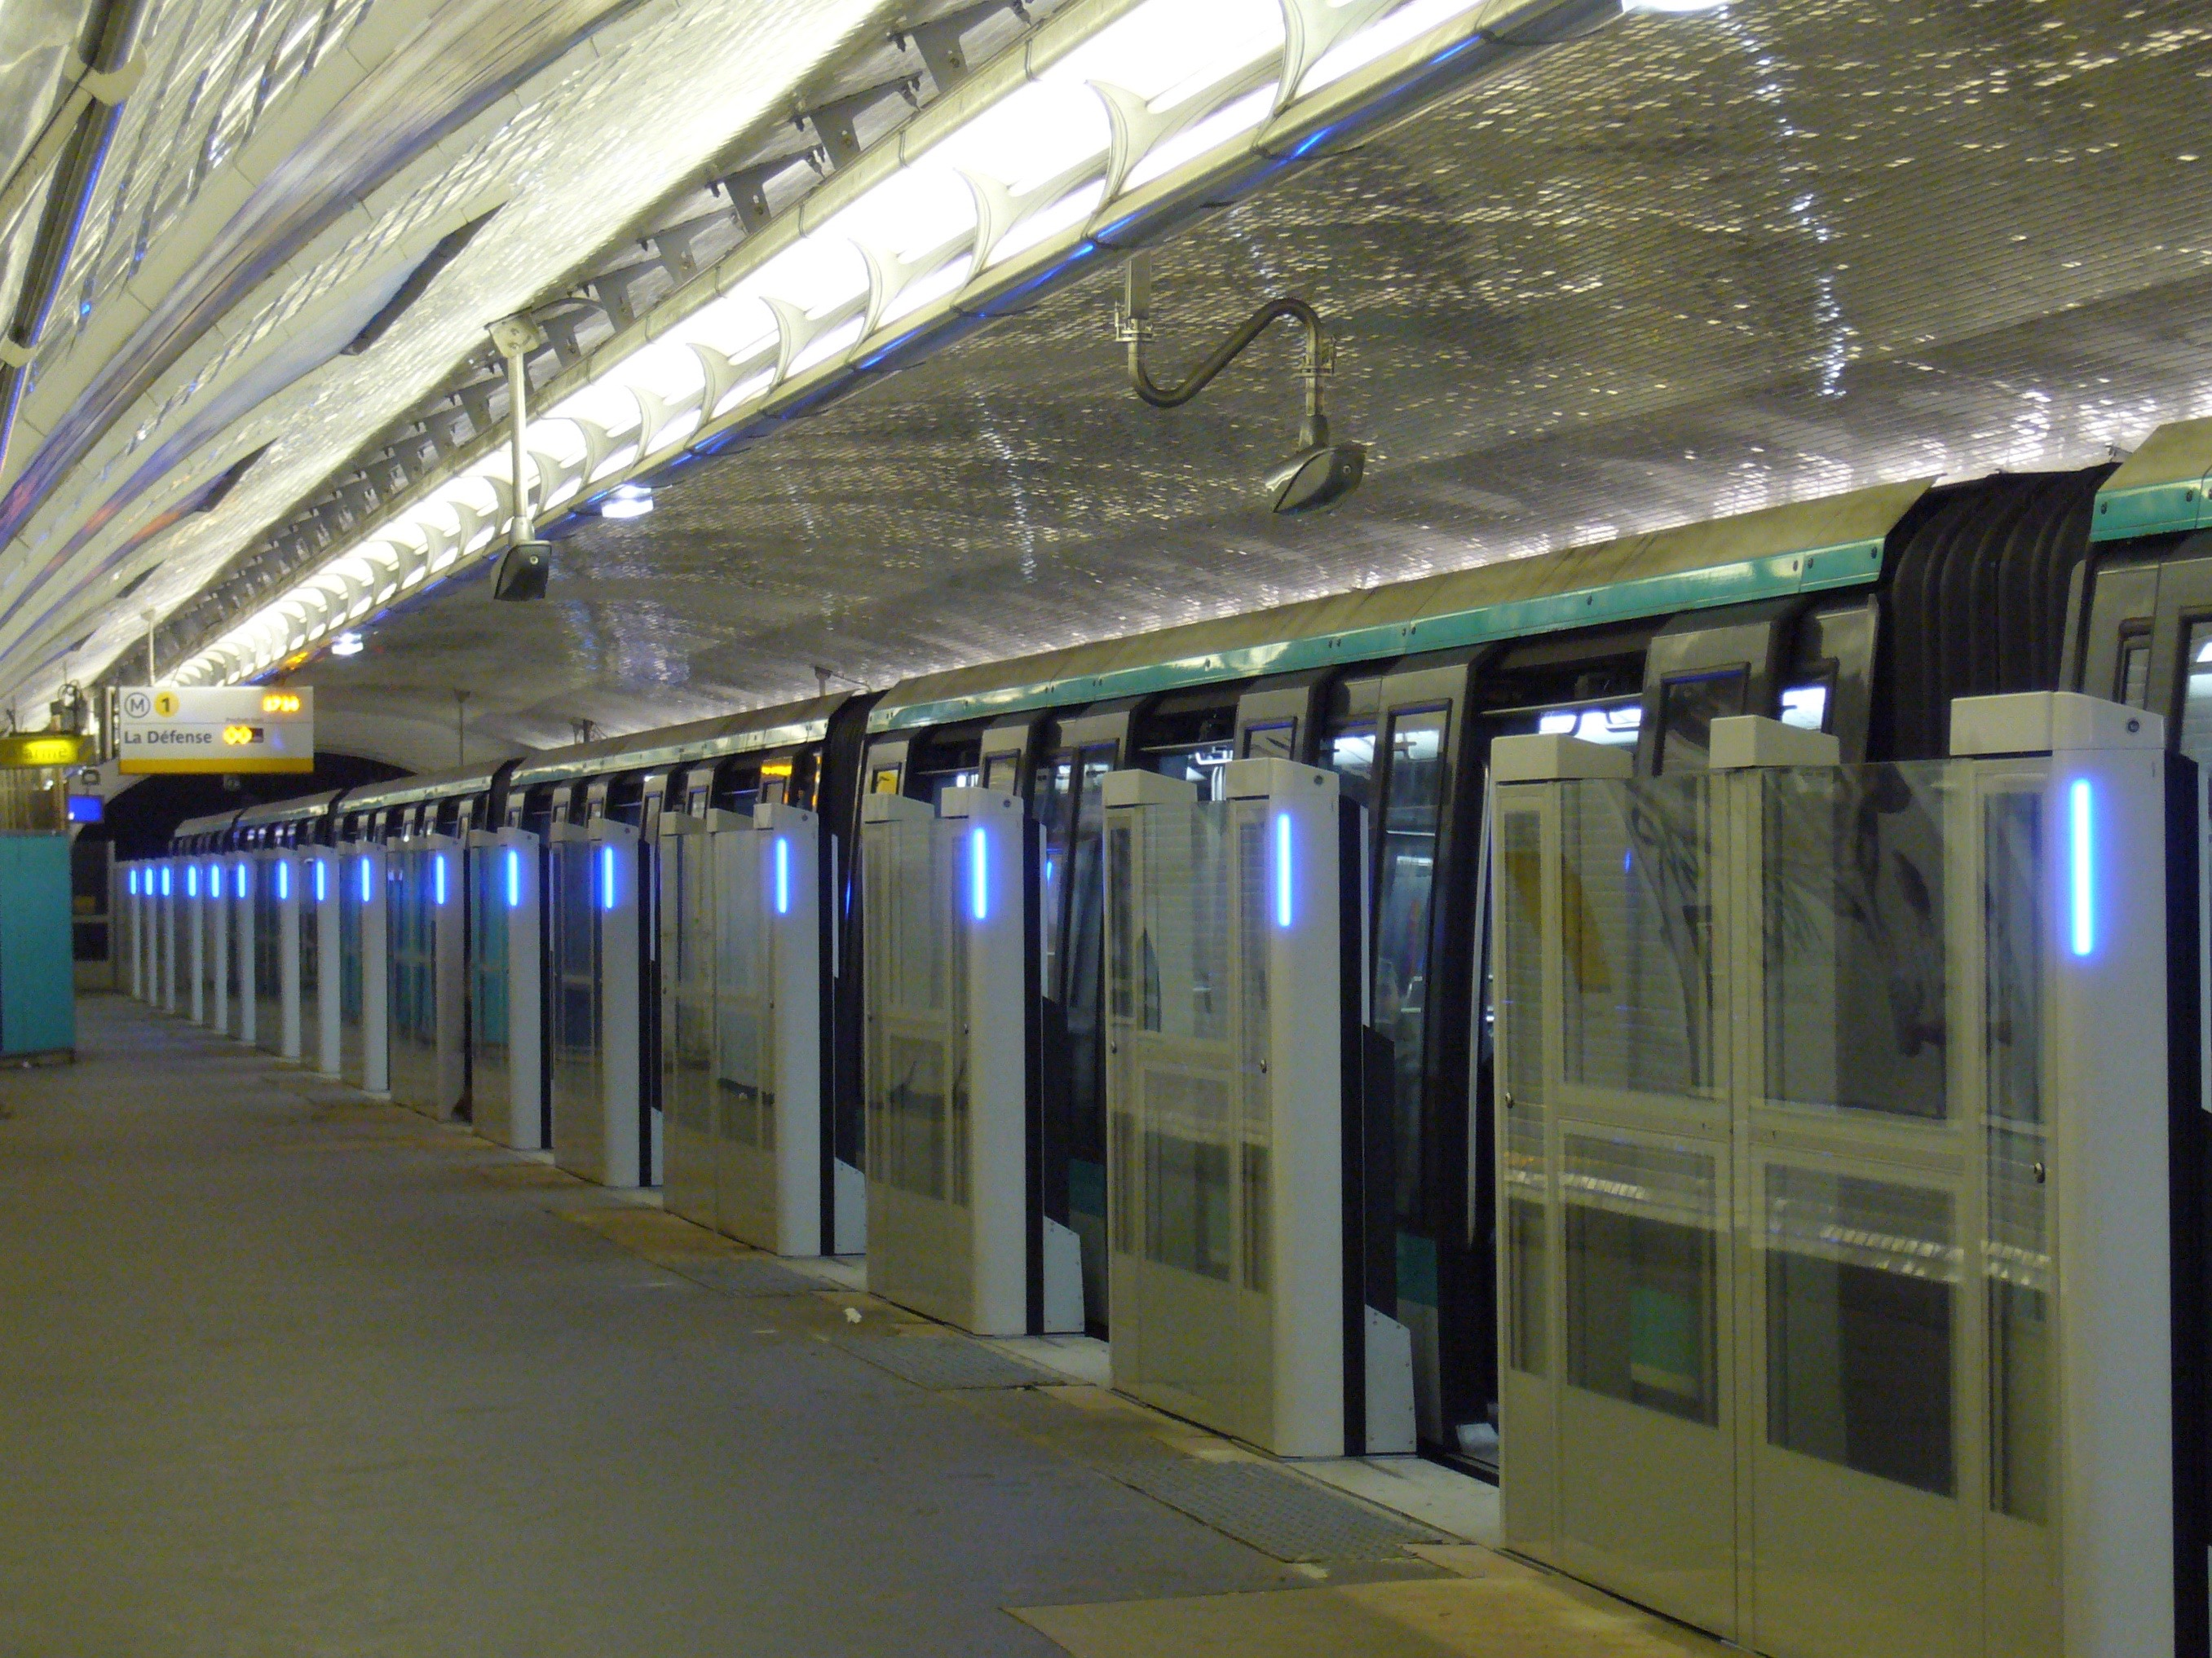 file metro paris ligne 1 berault installation facades de quai 33 jpg wikimedia commons. Black Bedroom Furniture Sets. Home Design Ideas